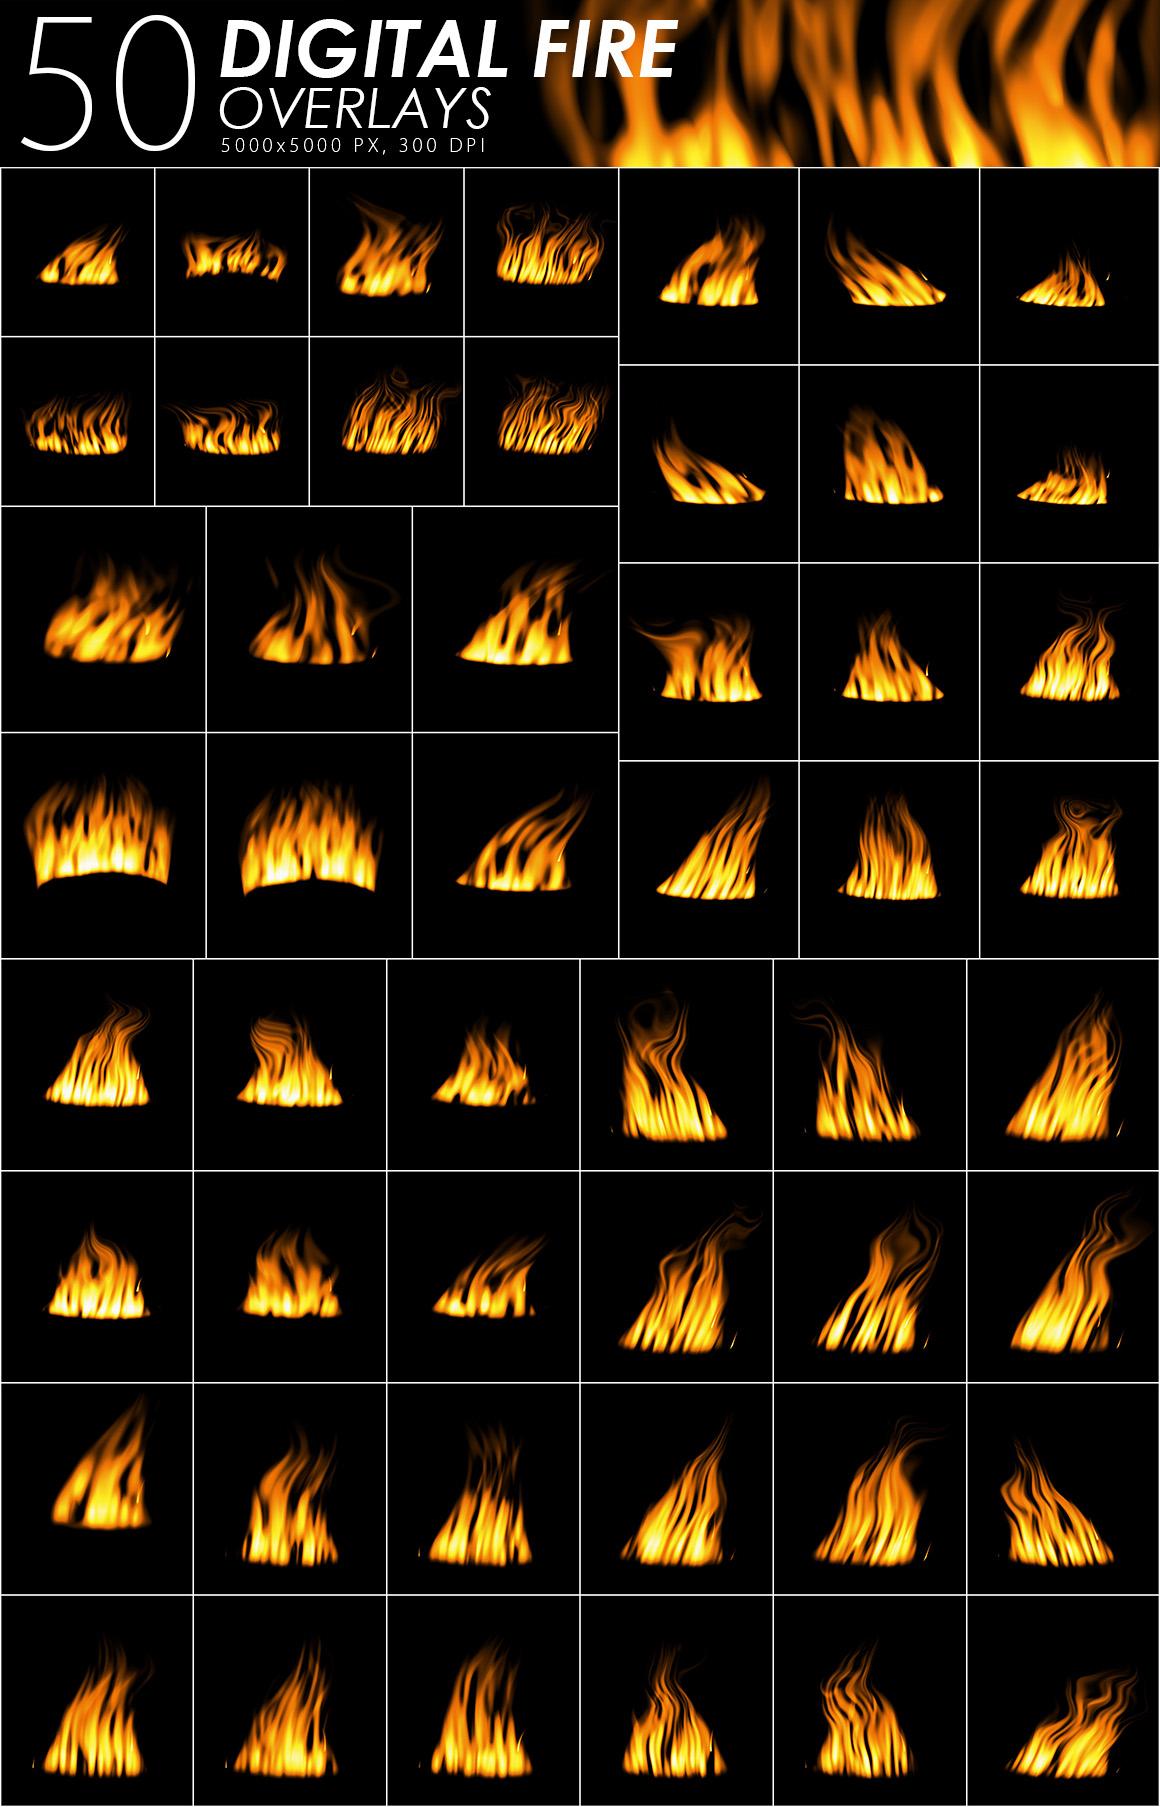 575 Fire, Smoke, Fog Overlays example image 4